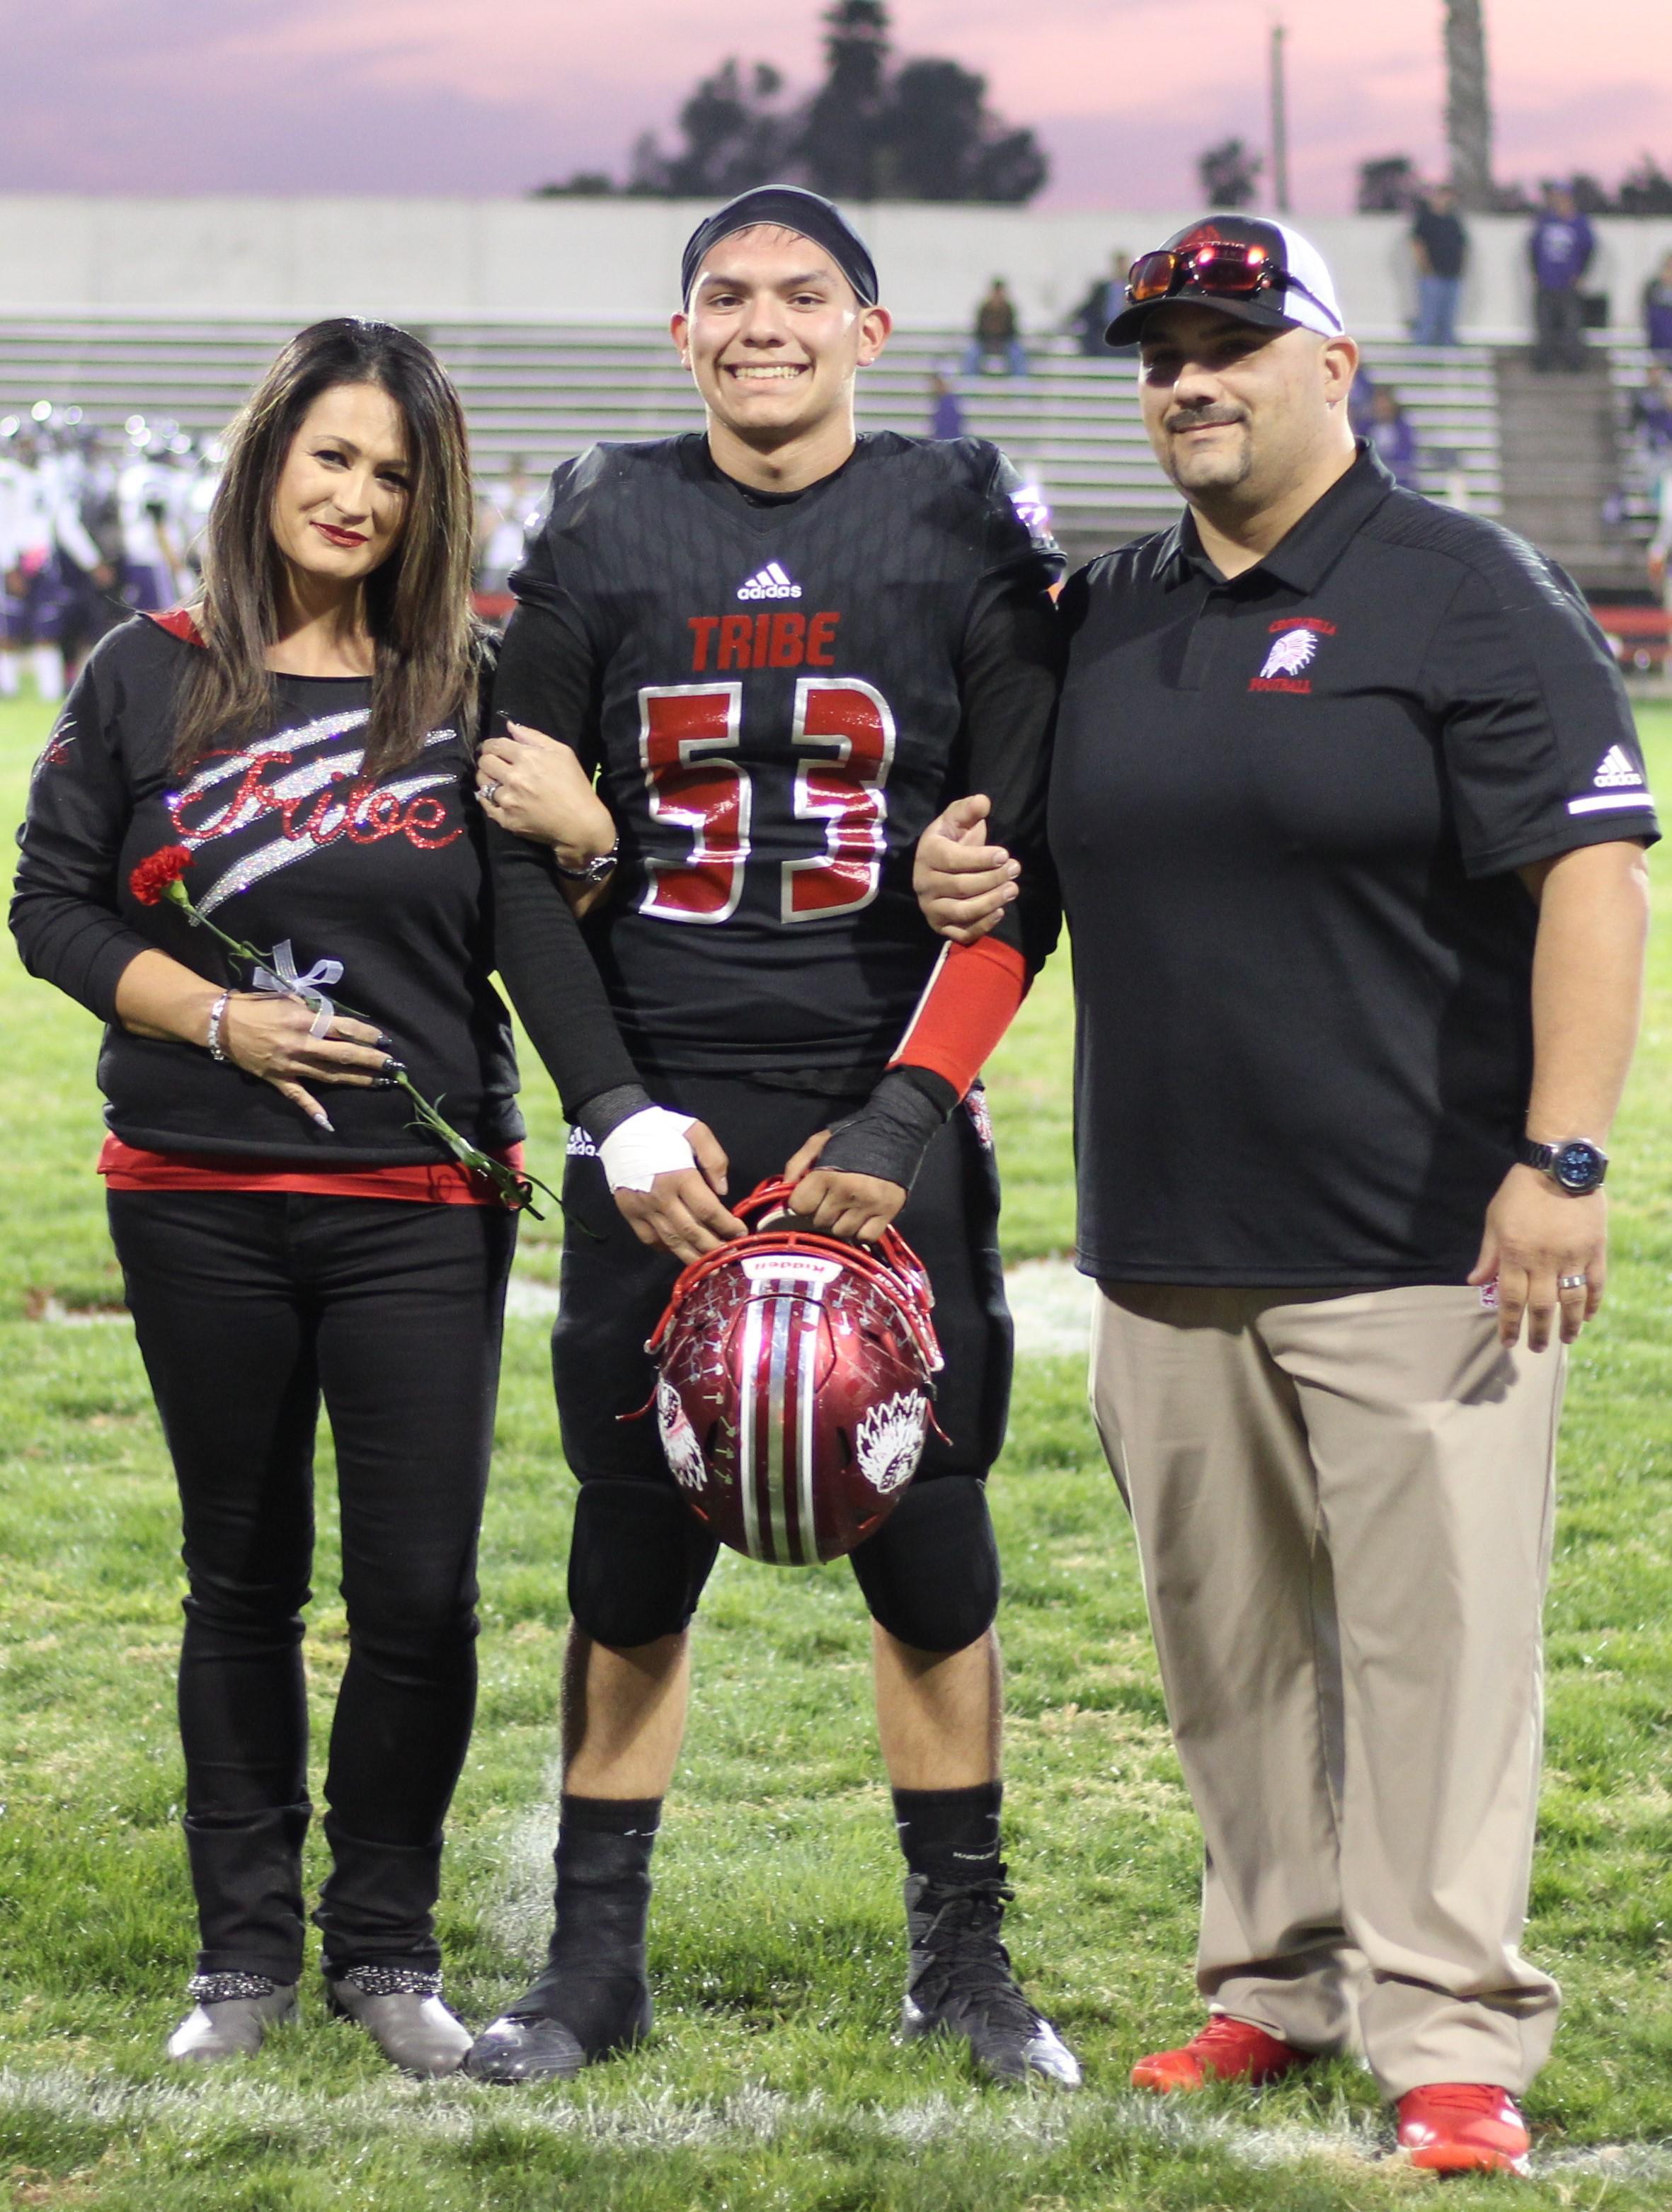 Senior football player Alex Escoto and his escorts.